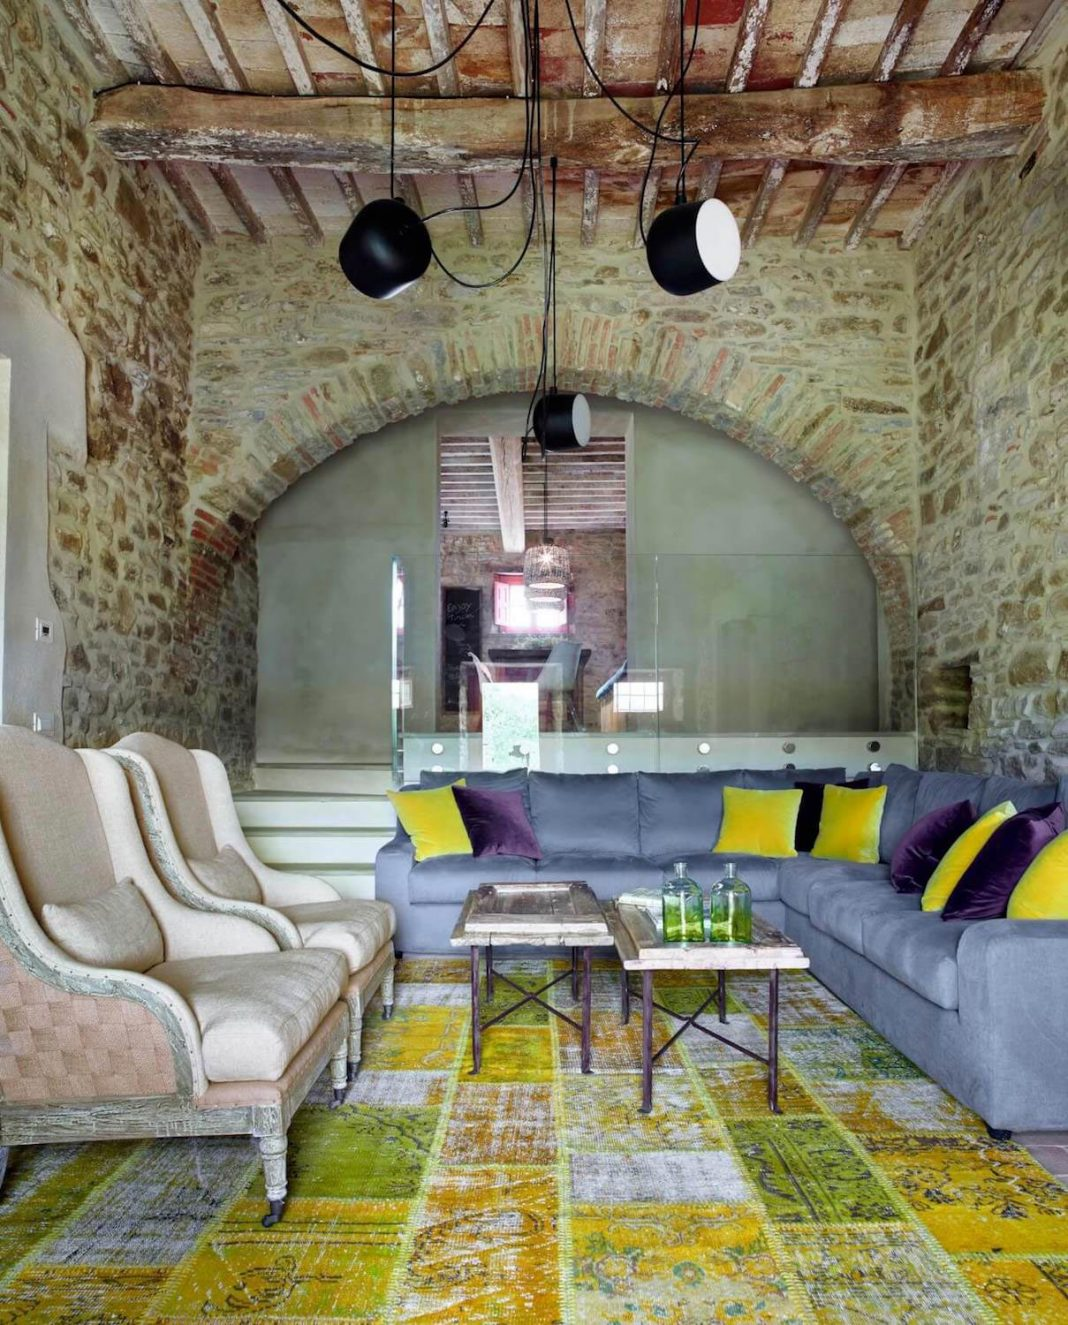 Unique historic Umbrian farmhouse by SpecialUmbria